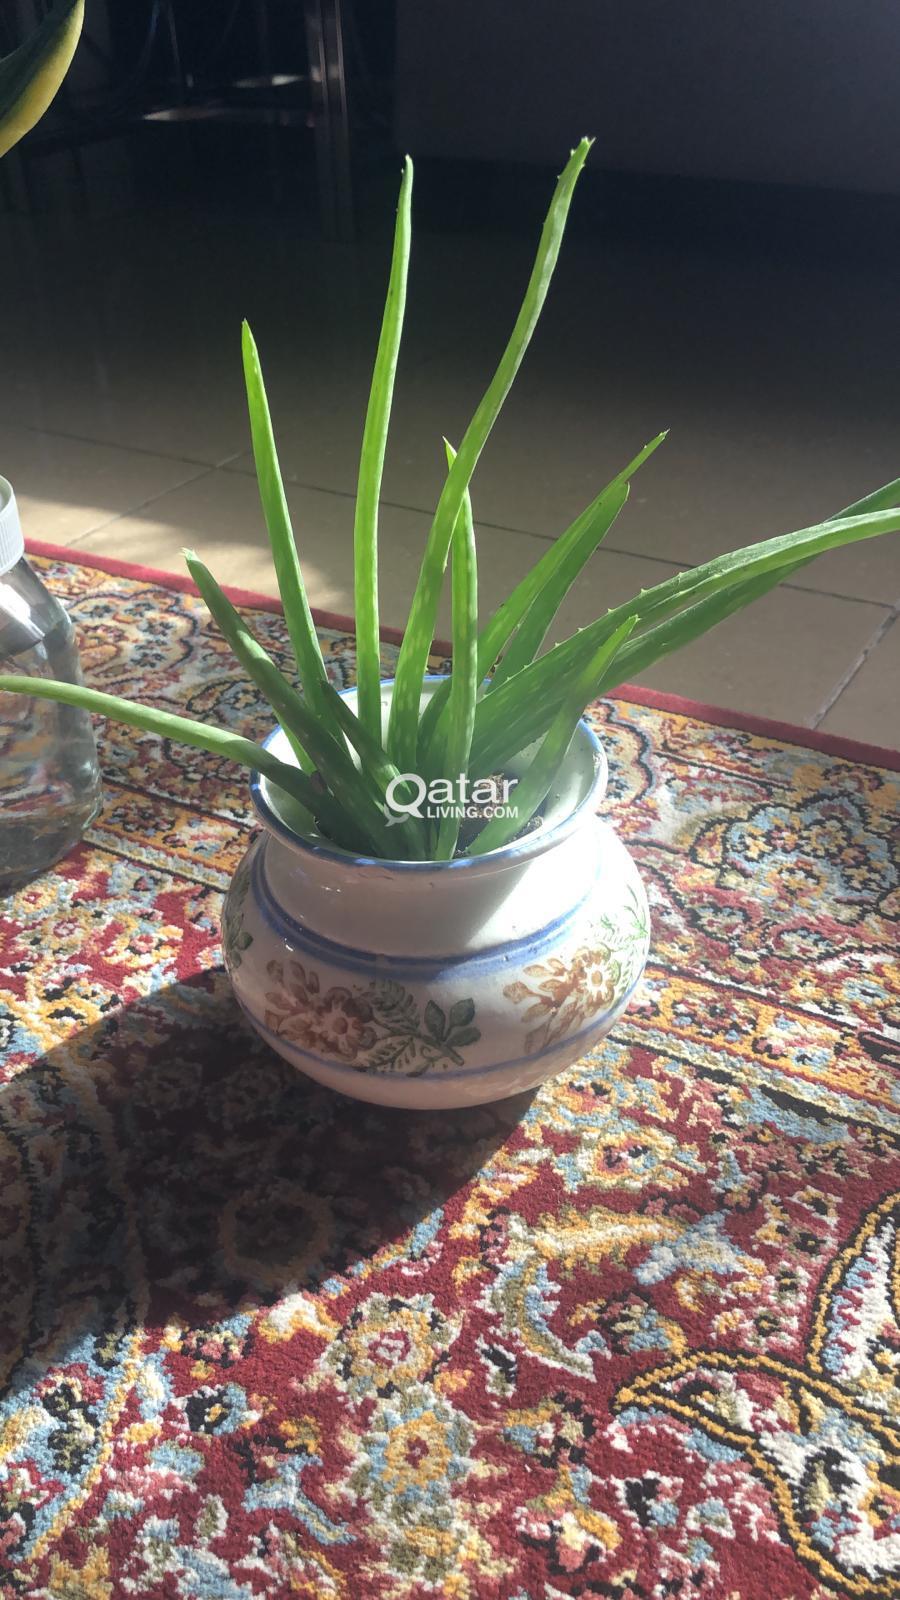 Where To Buy Aloe Vera Plant In Qatar - Plantă Blog